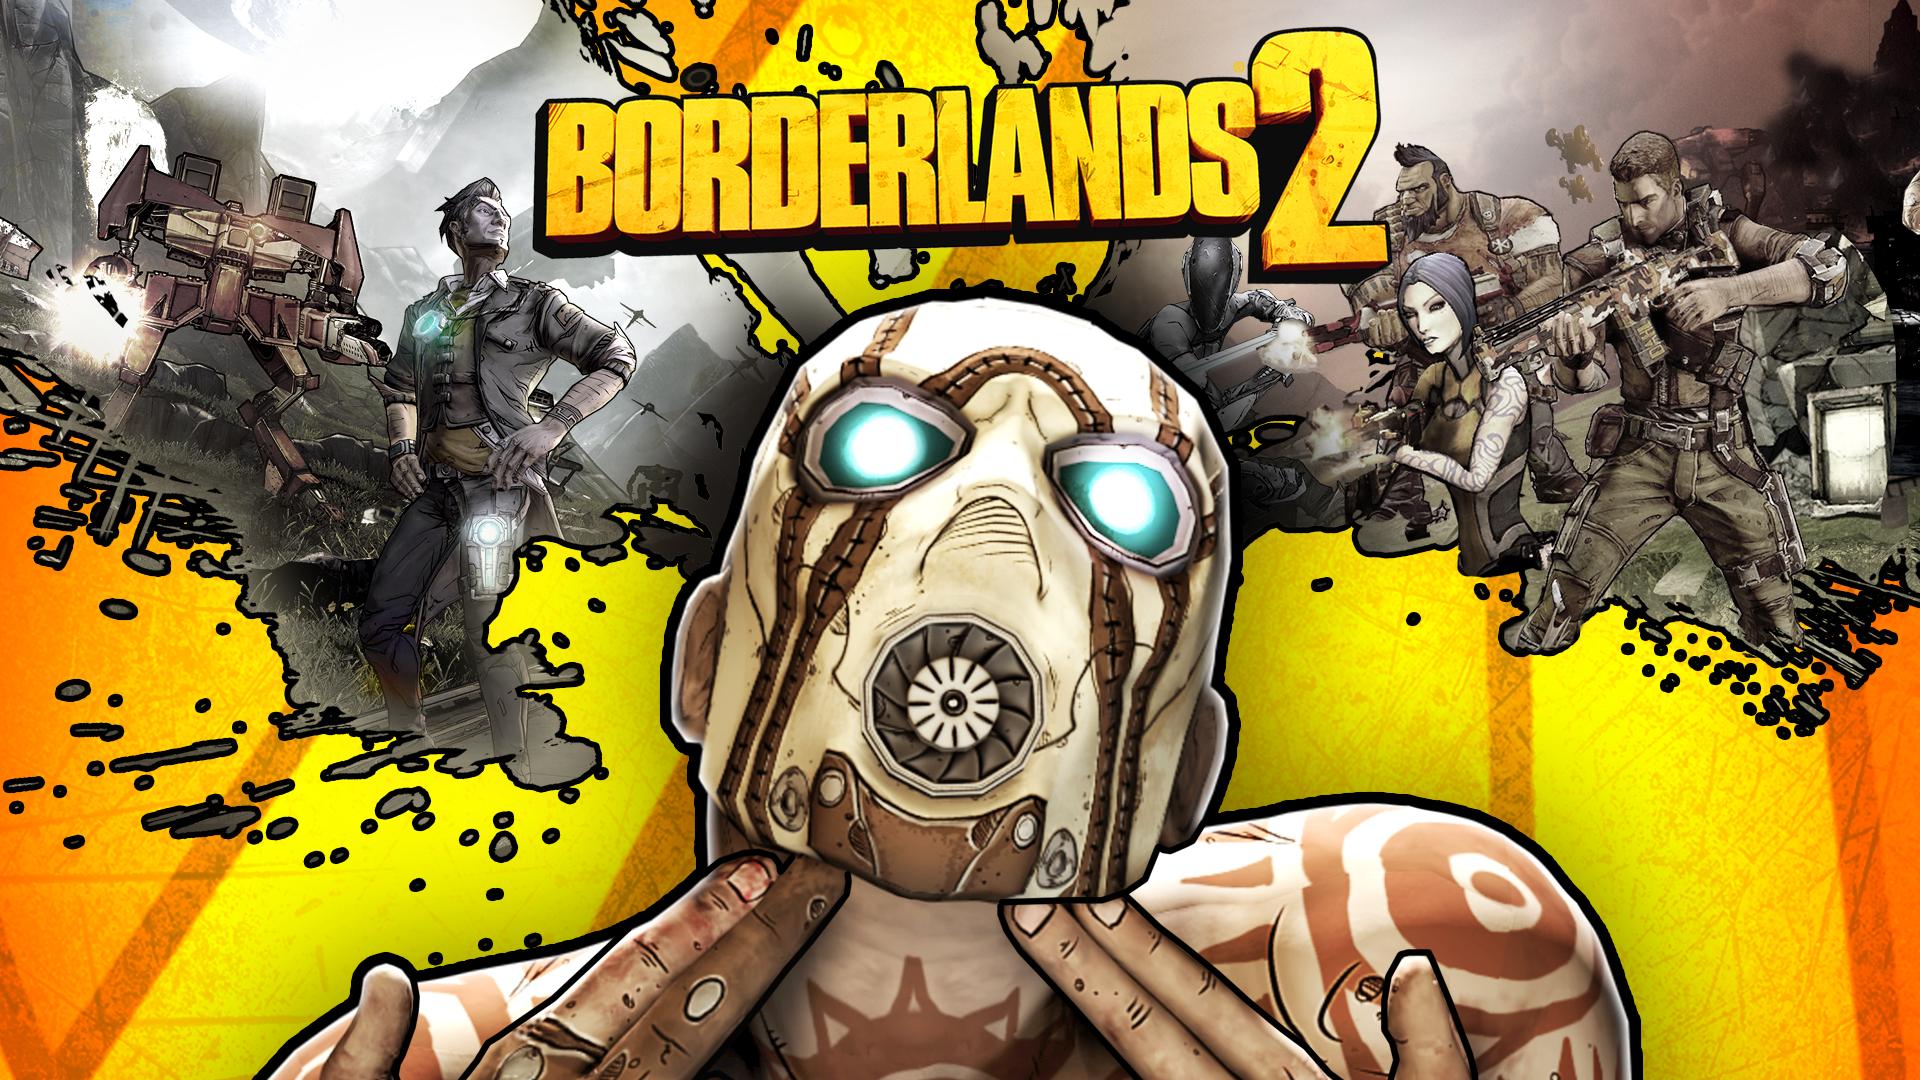 Xbox Borderlands 2 gameplay, Achievements, Xbox clips, Gifs